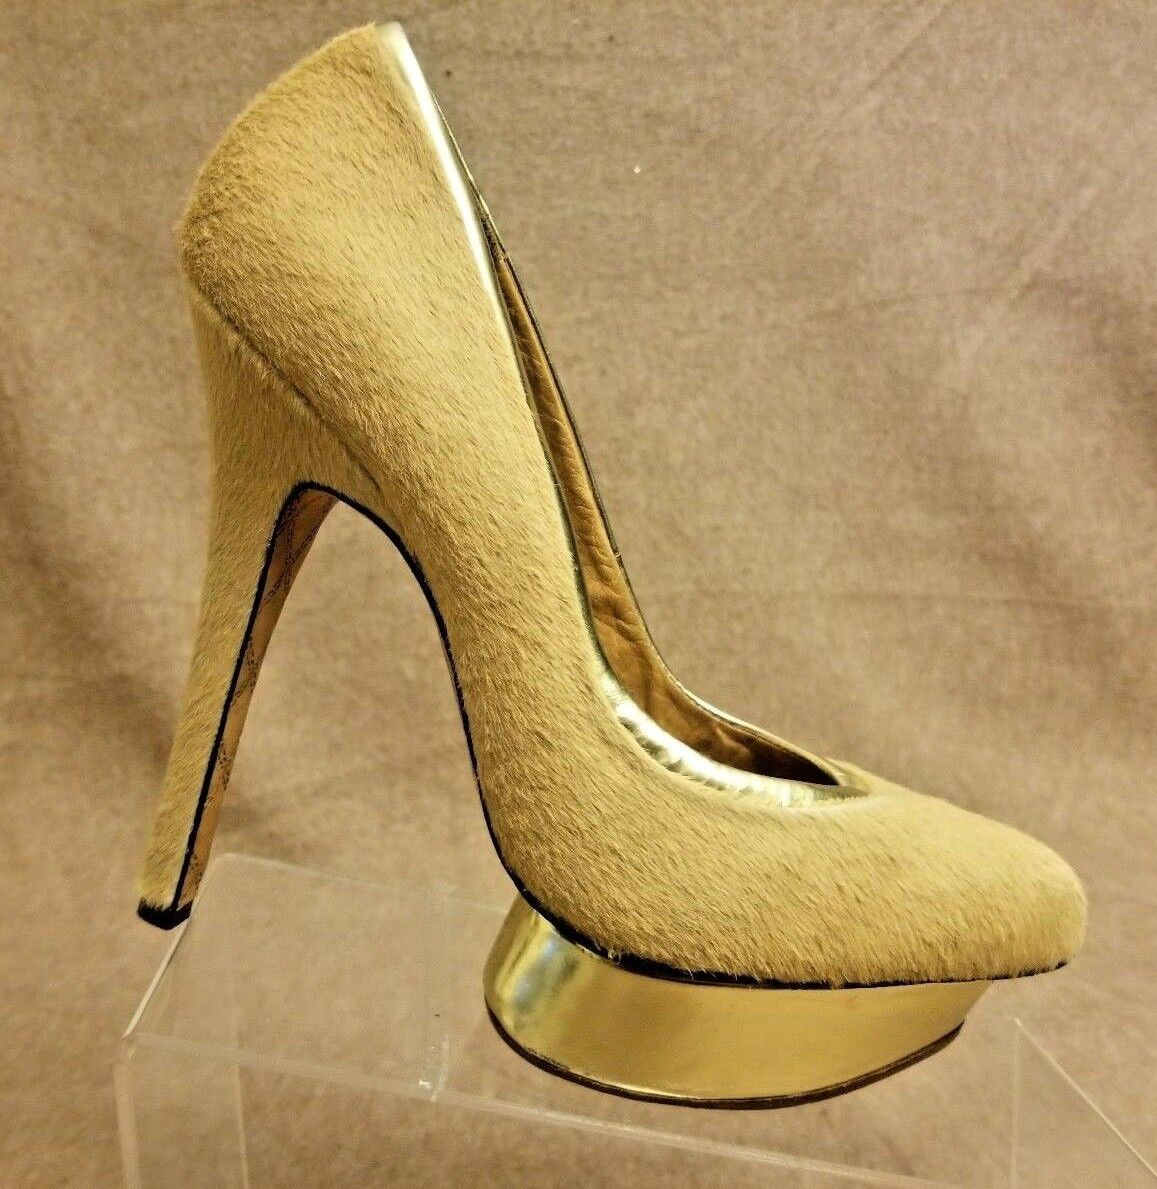 L.A.M.B Damens Tan Nude Platform Pumps Calf Hair Stiletto High Heels Größe 10 M